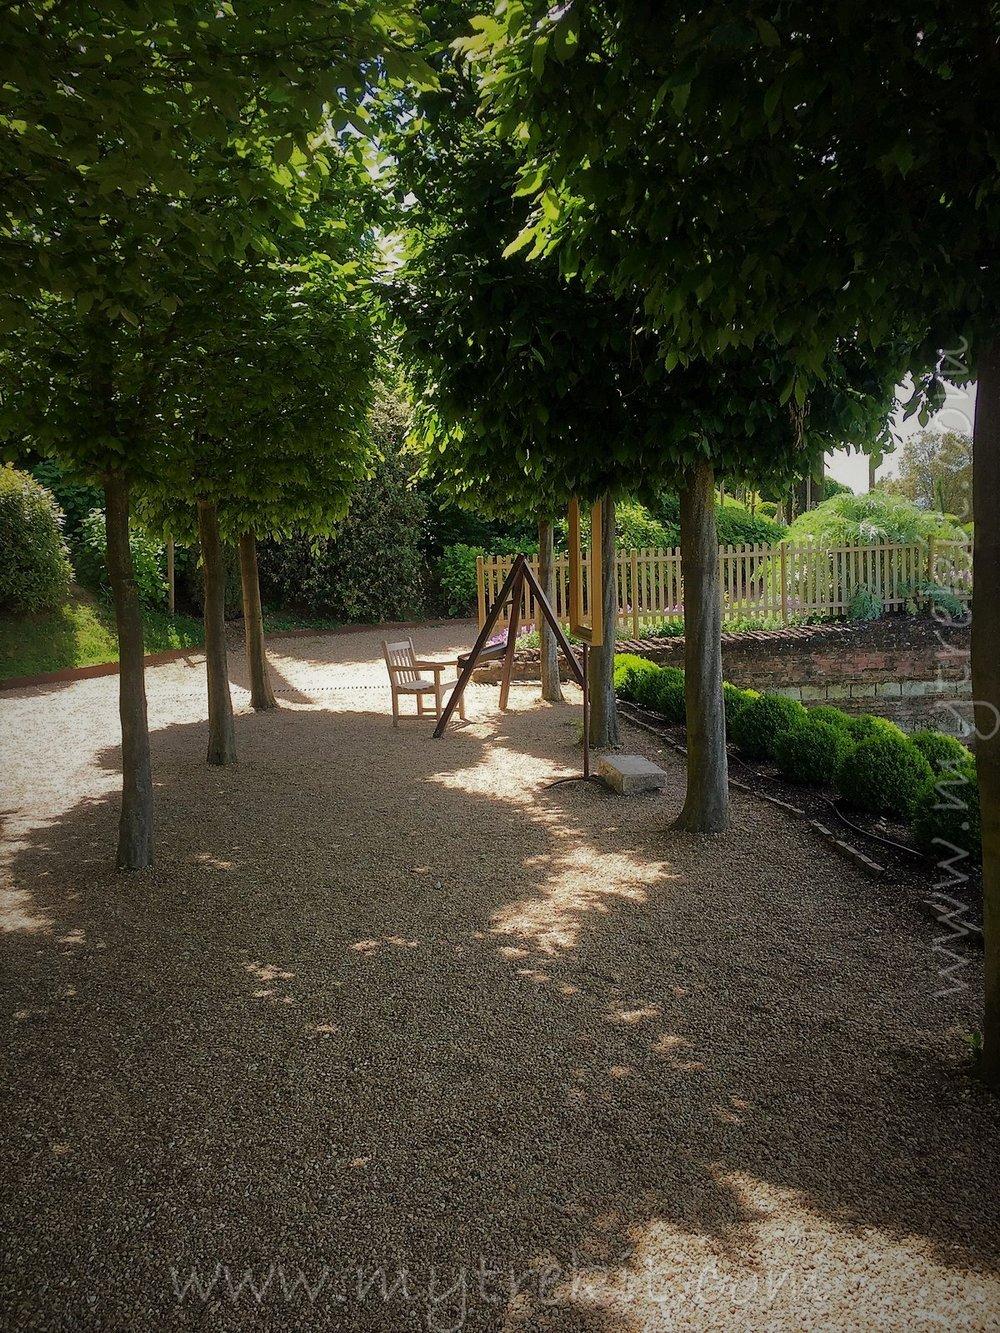 Italian-style topiary arbor